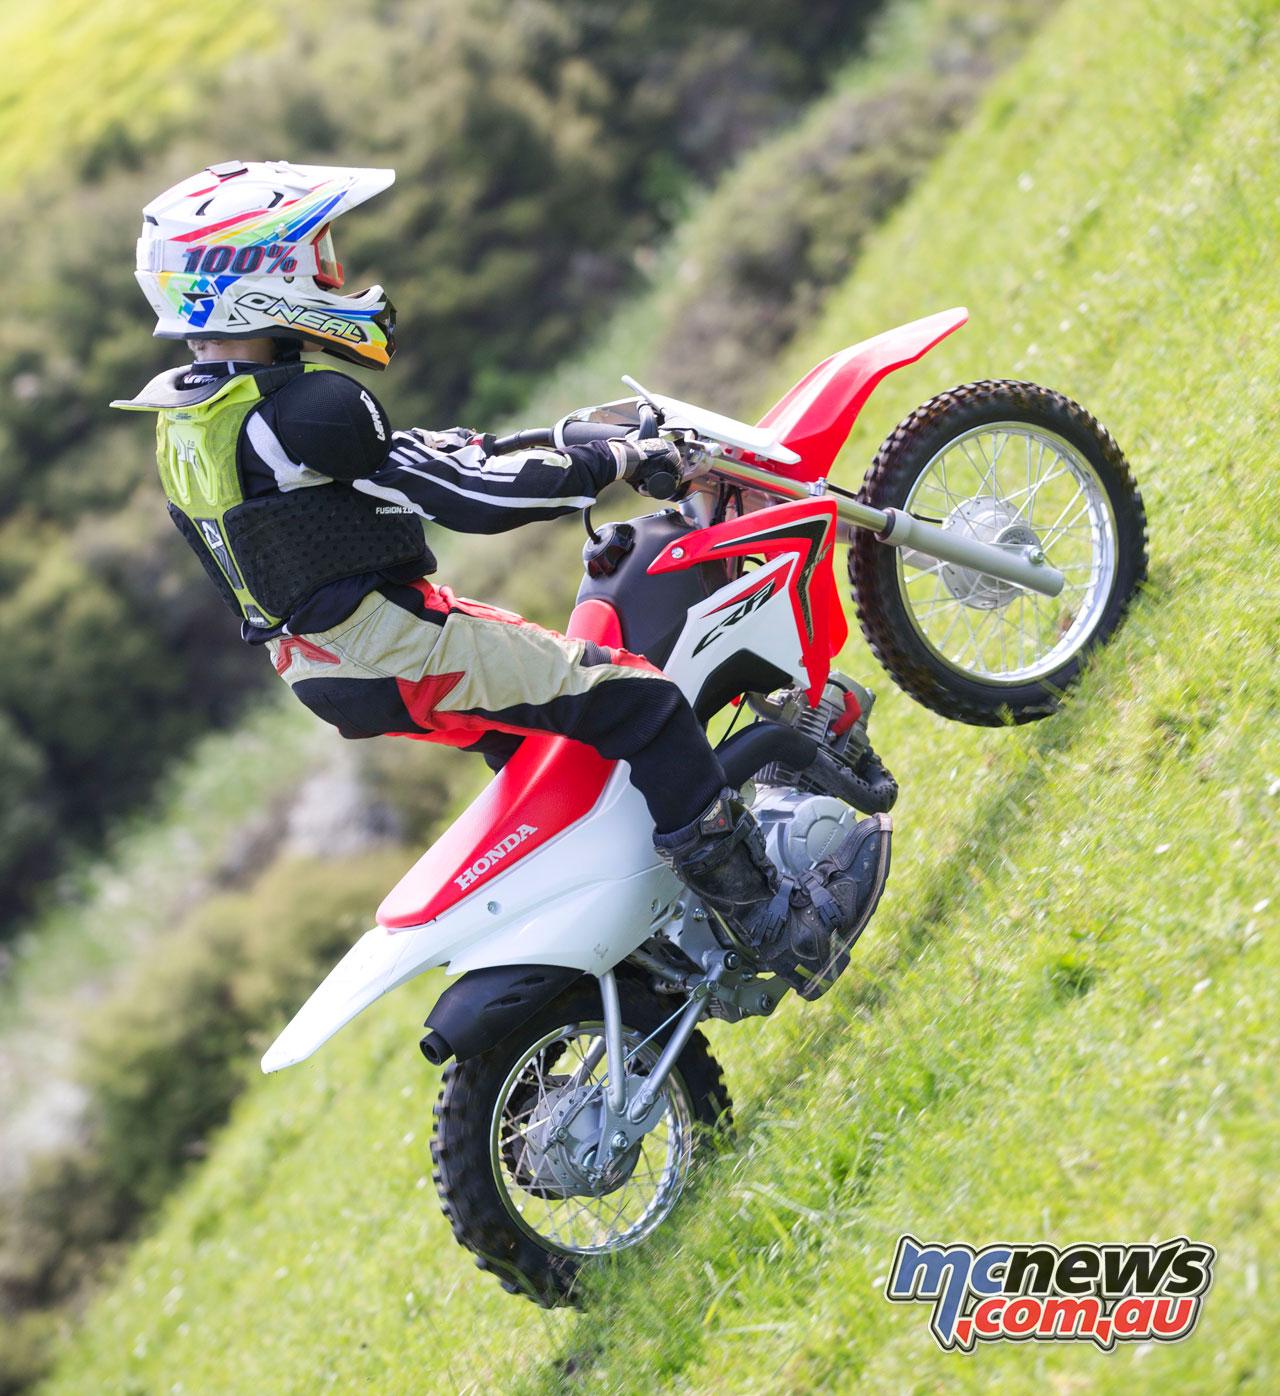 Honda Crf 125 Price: Honda Kids Bikes Review CRF50F CRF110F CRF125F